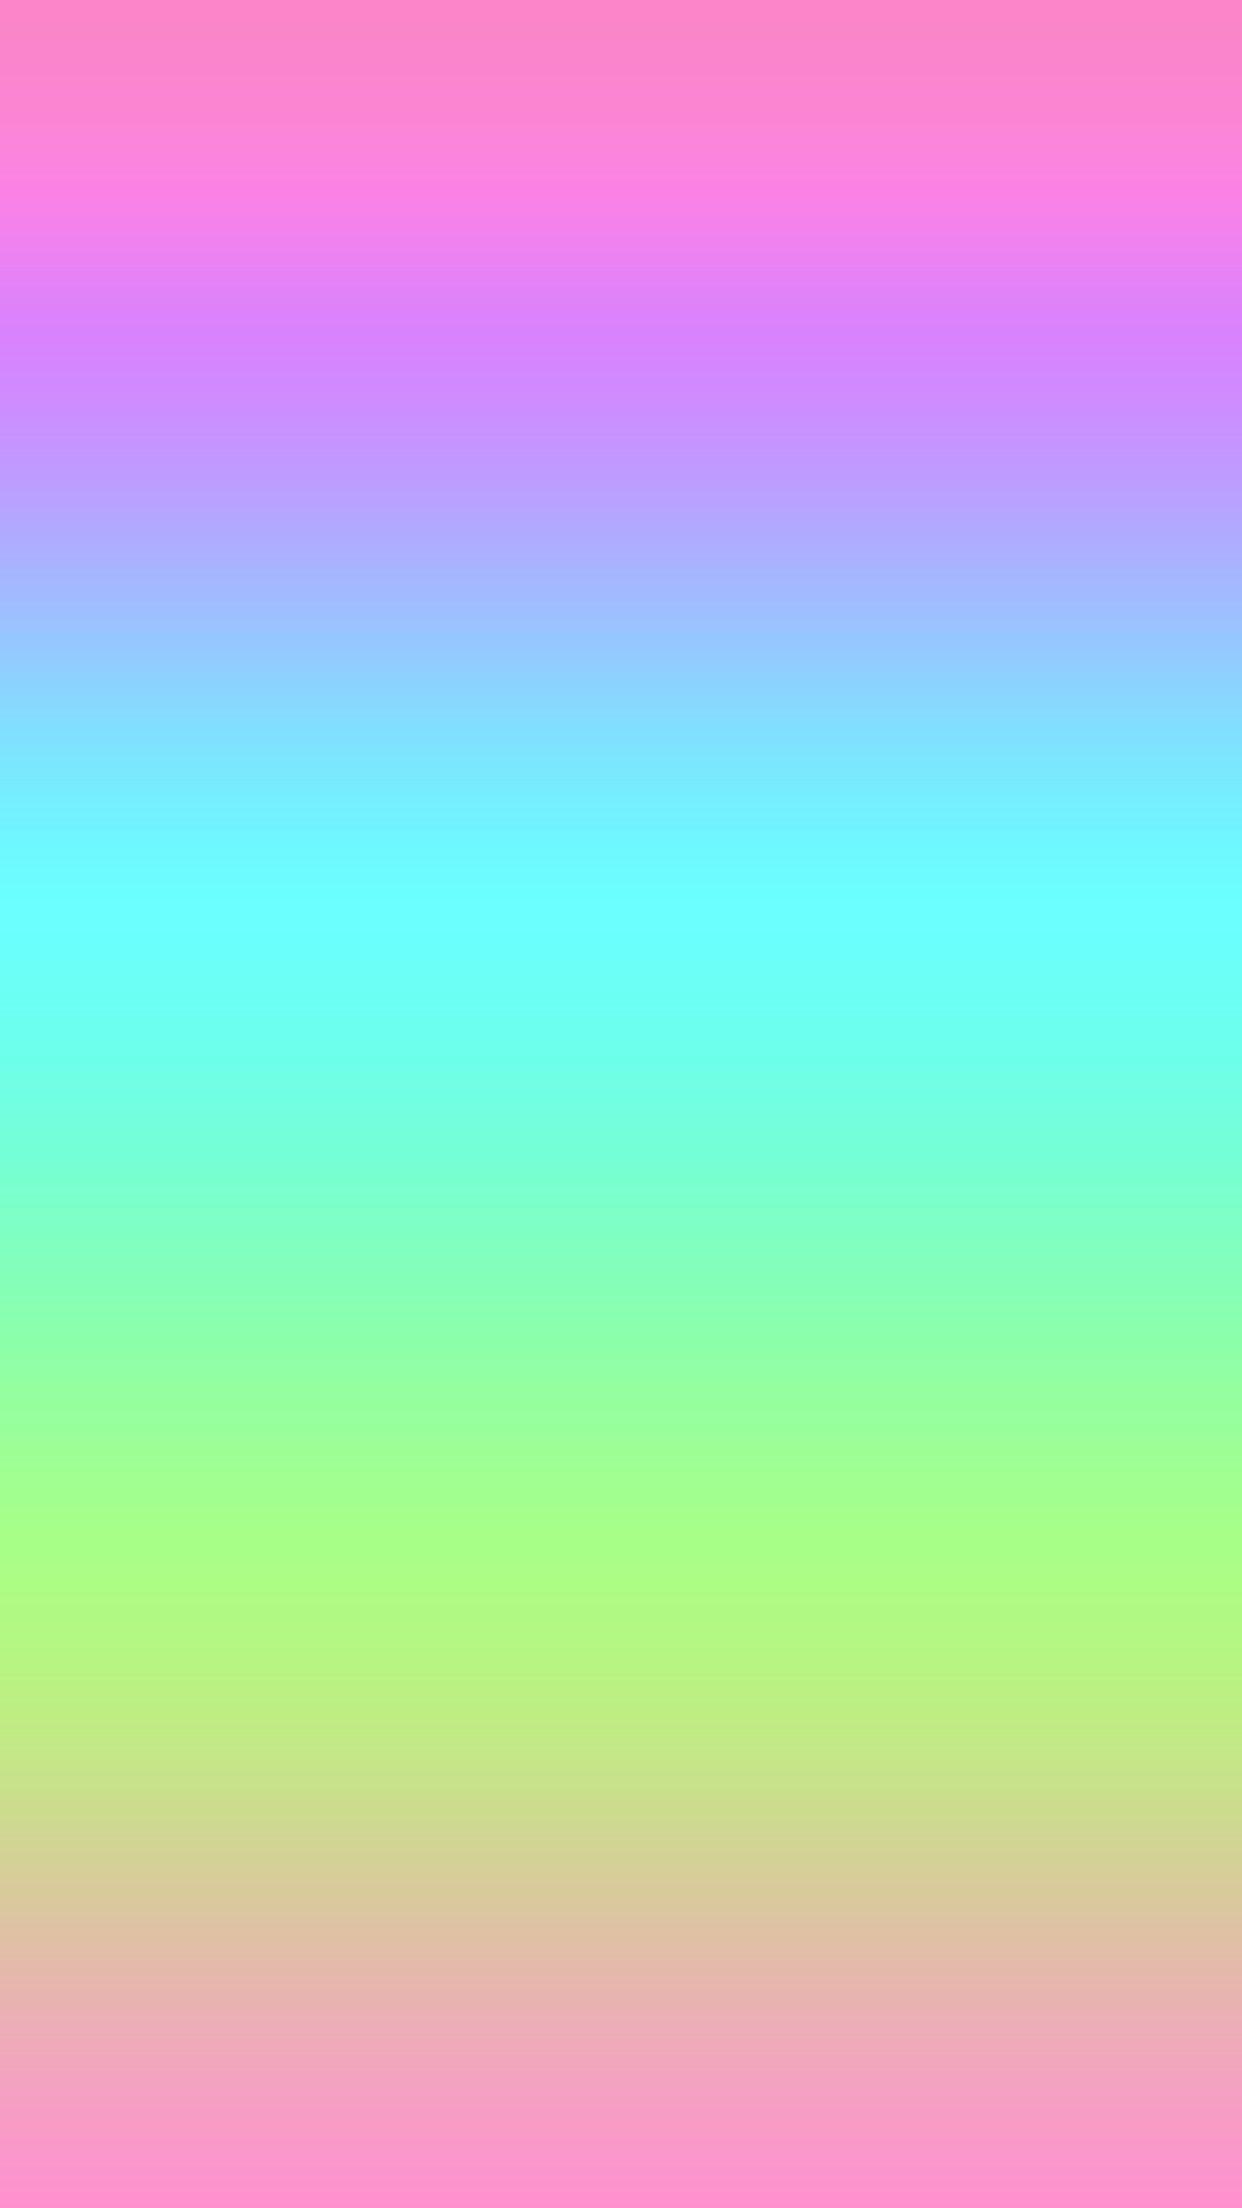 Aesthetic Rainbow Computer Wallpaper Http Wallpapersalbum Com Aesthetic Rainbow Computer Wallpaper Html In 2020 Pastel Rainbow Phone Wallpaper Rainbow Wallpaper